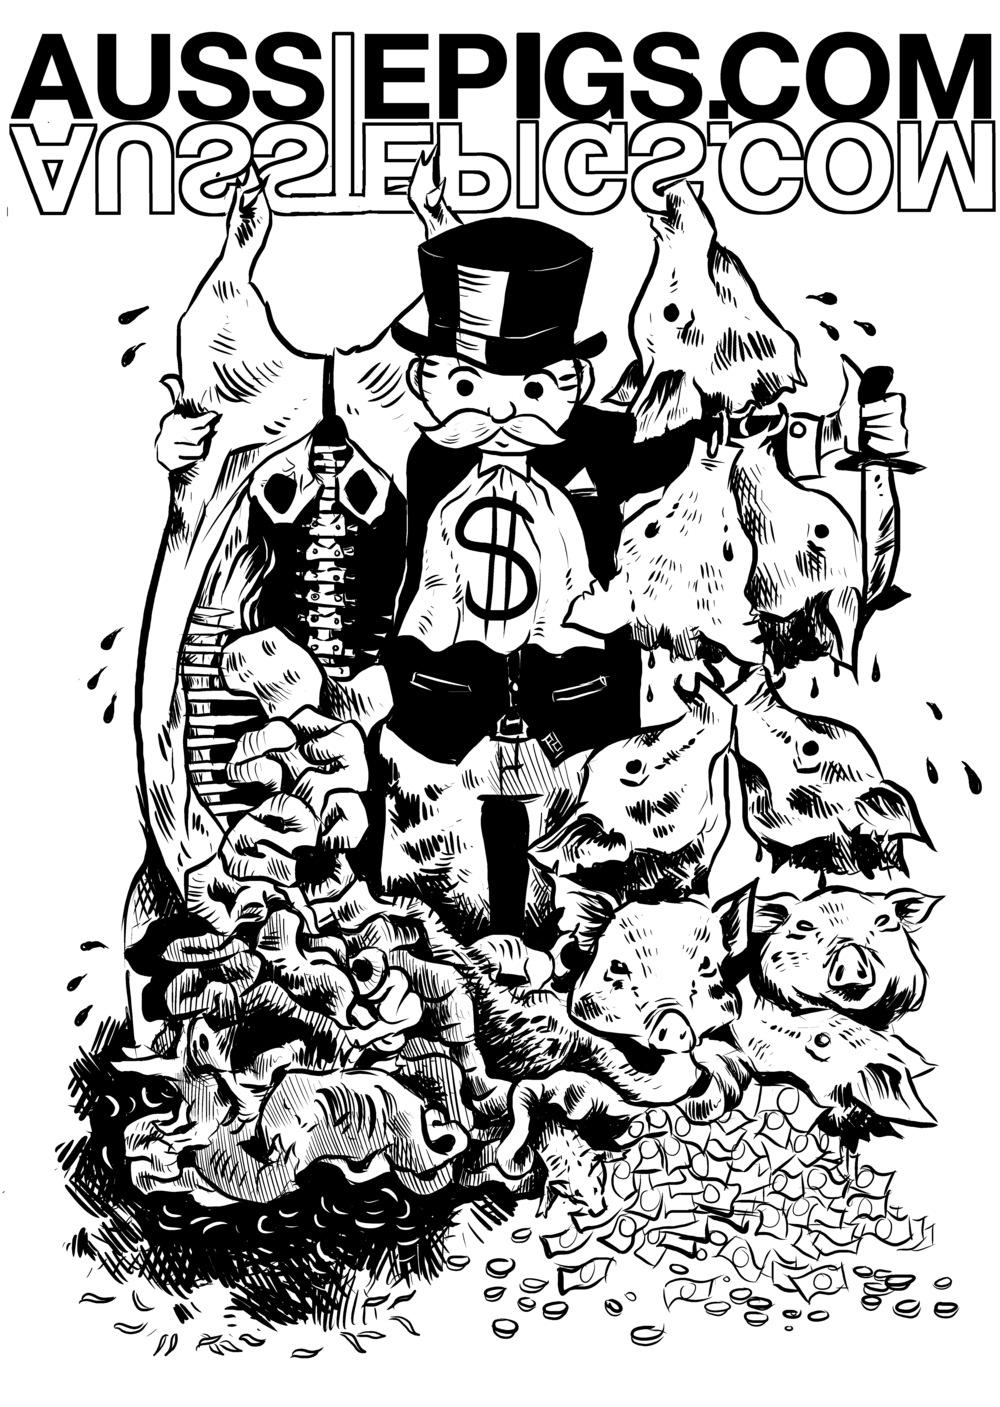 Monopoly man.jpg